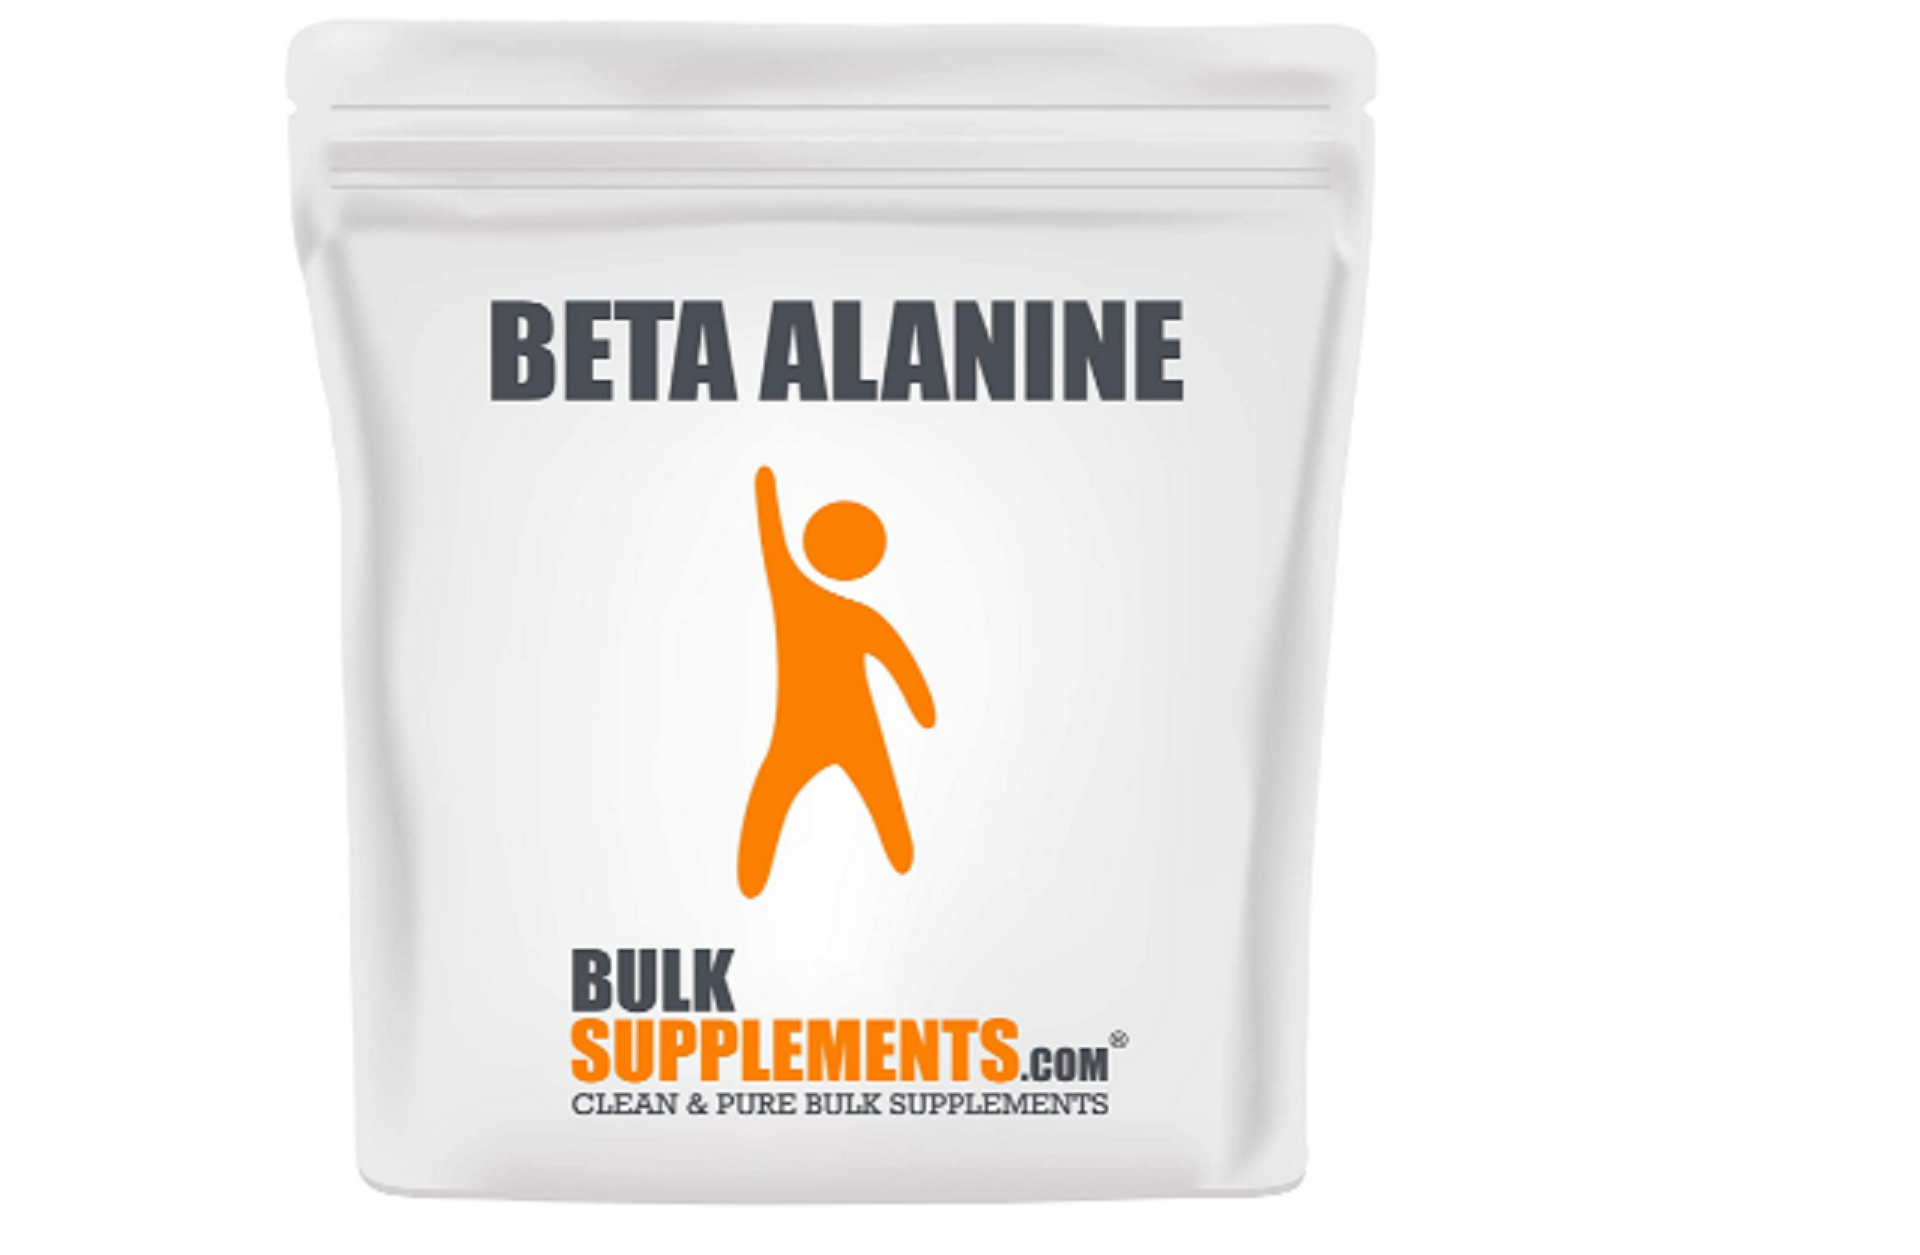 bulk supplements beta alanine supplements